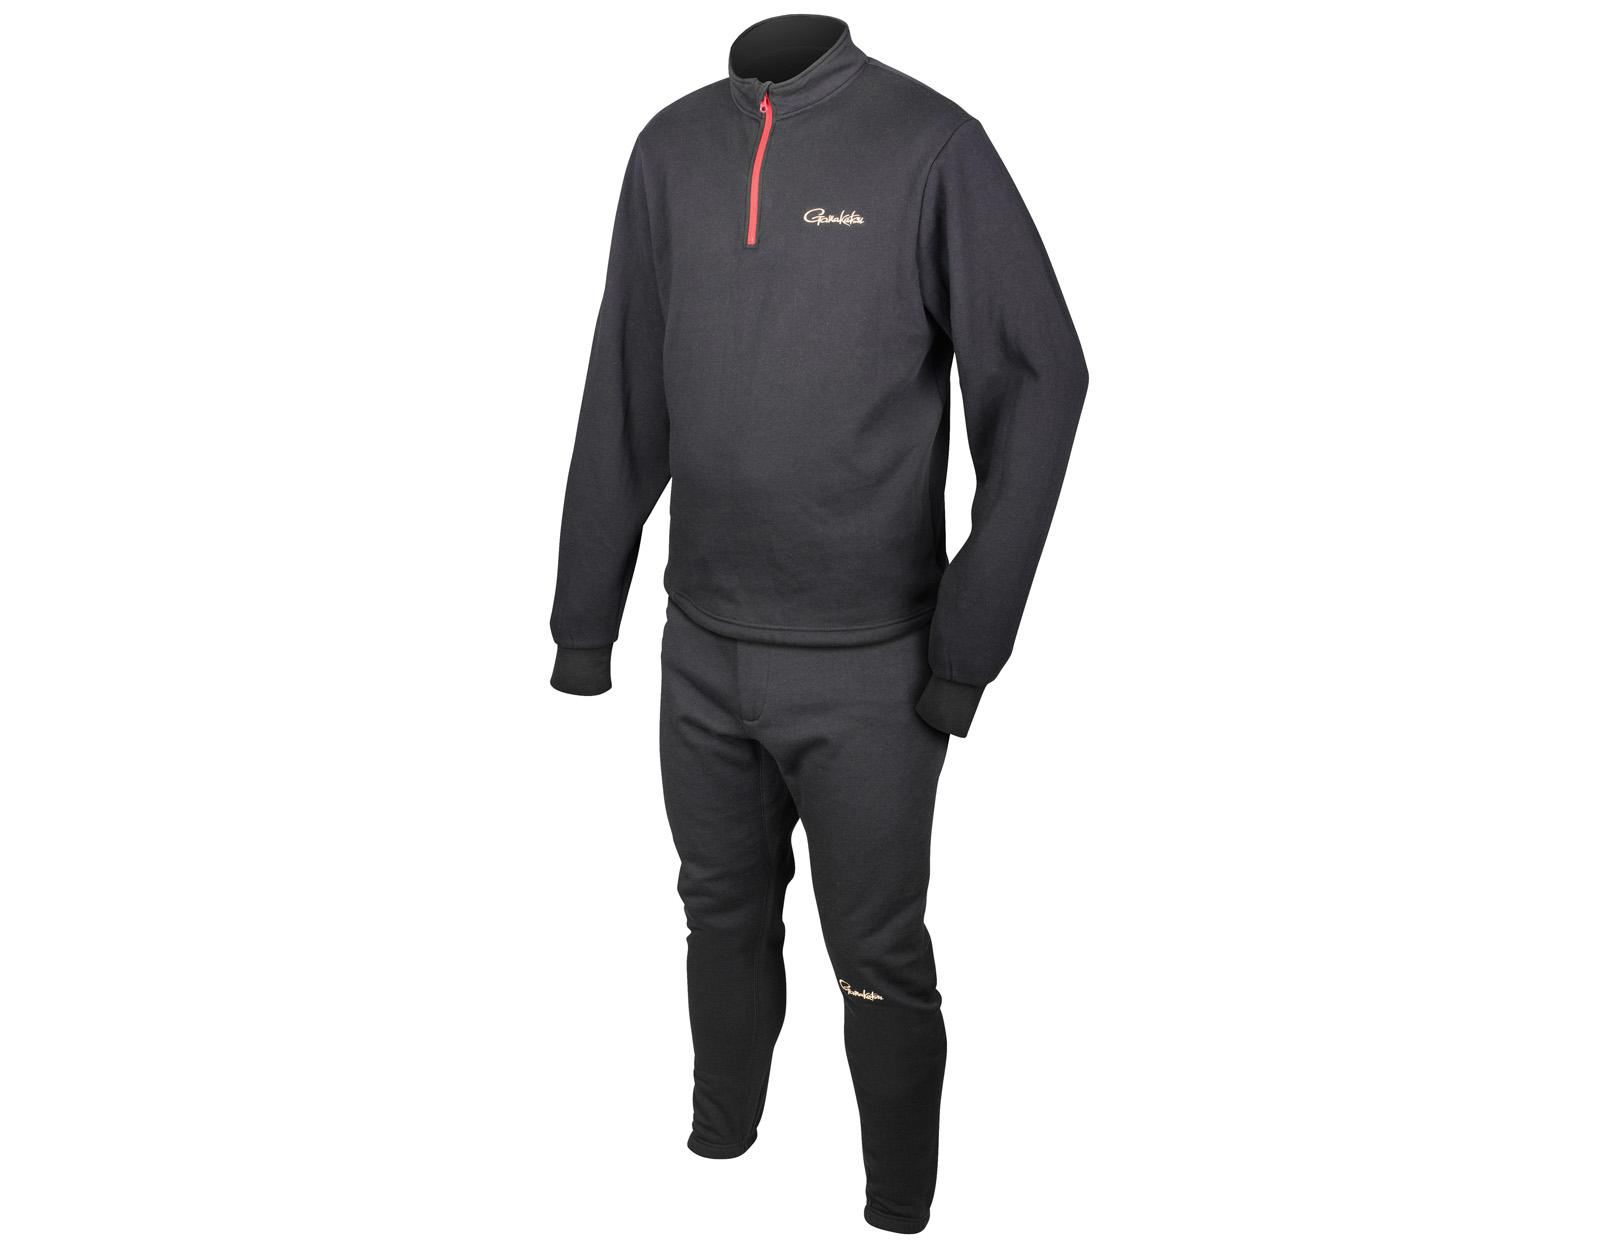 Gamakatsu Thermal Inner Suit Suit Suit Atmungsaktiv M L XL XXL XXXL Thermounterwäsche NEW a1d5dc